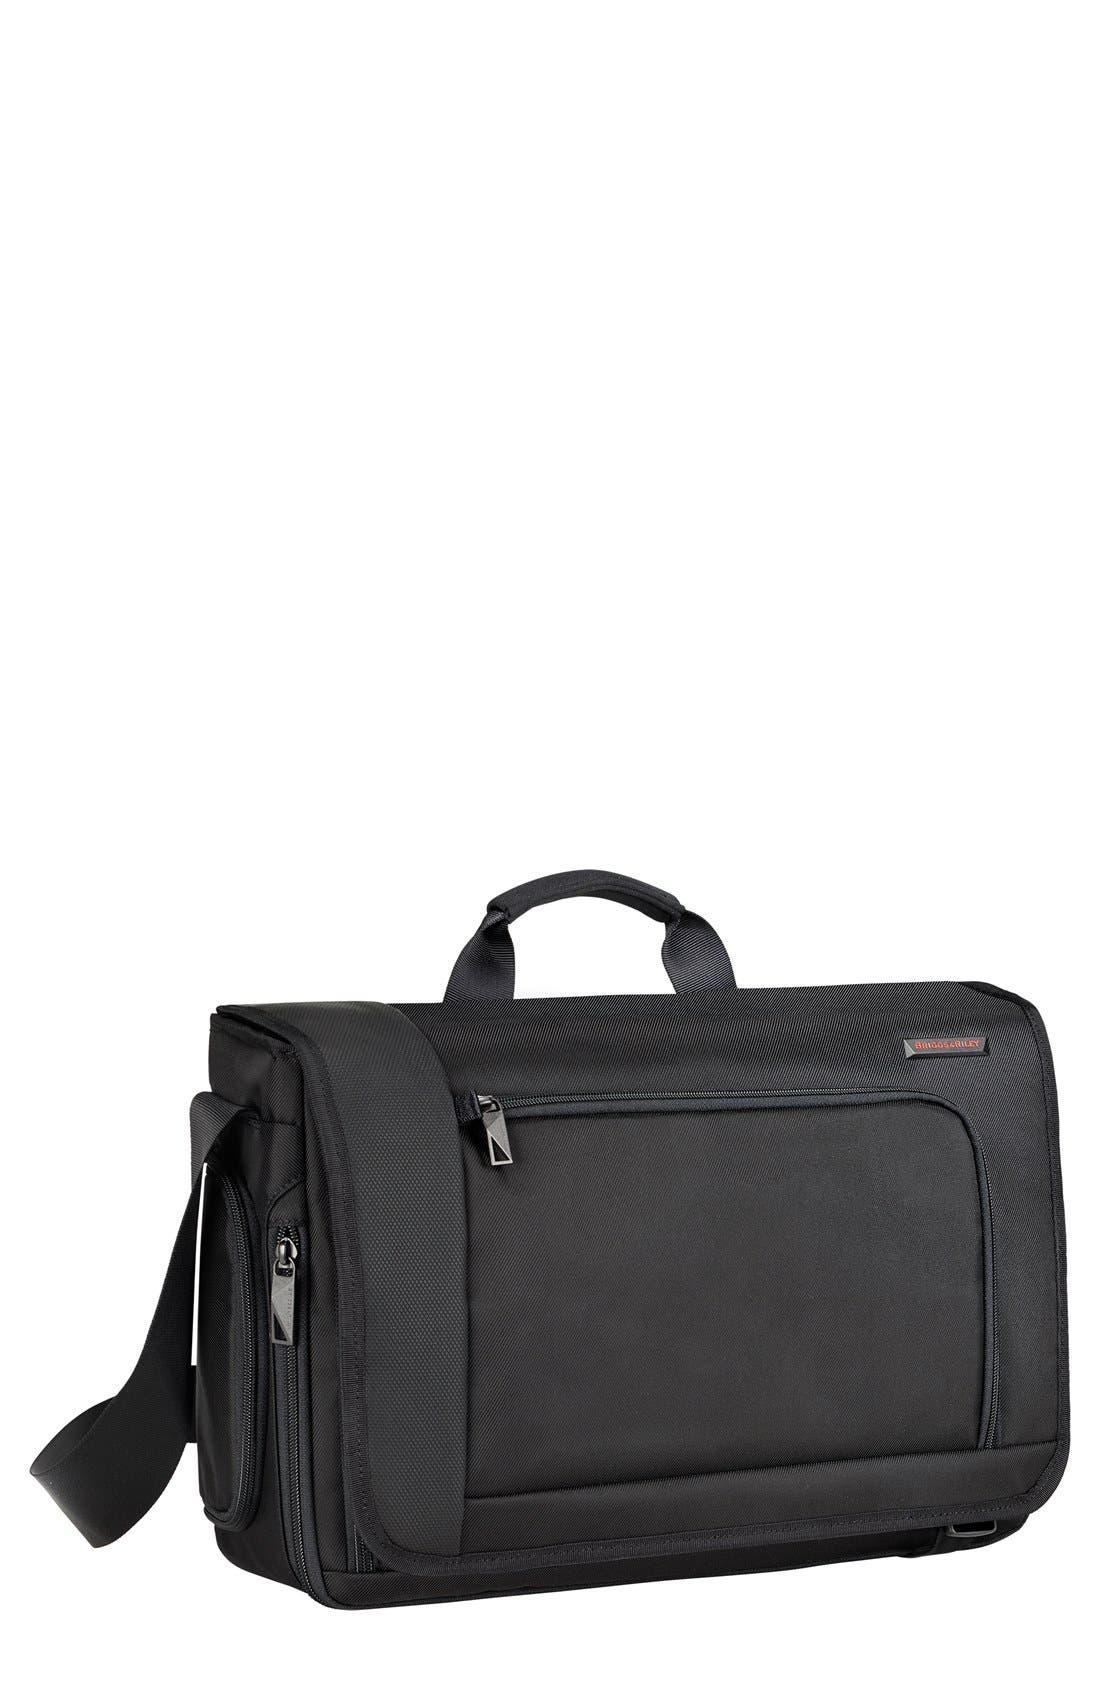 BRIGGS & RILEY Verb - Dispatch Messenger Bag